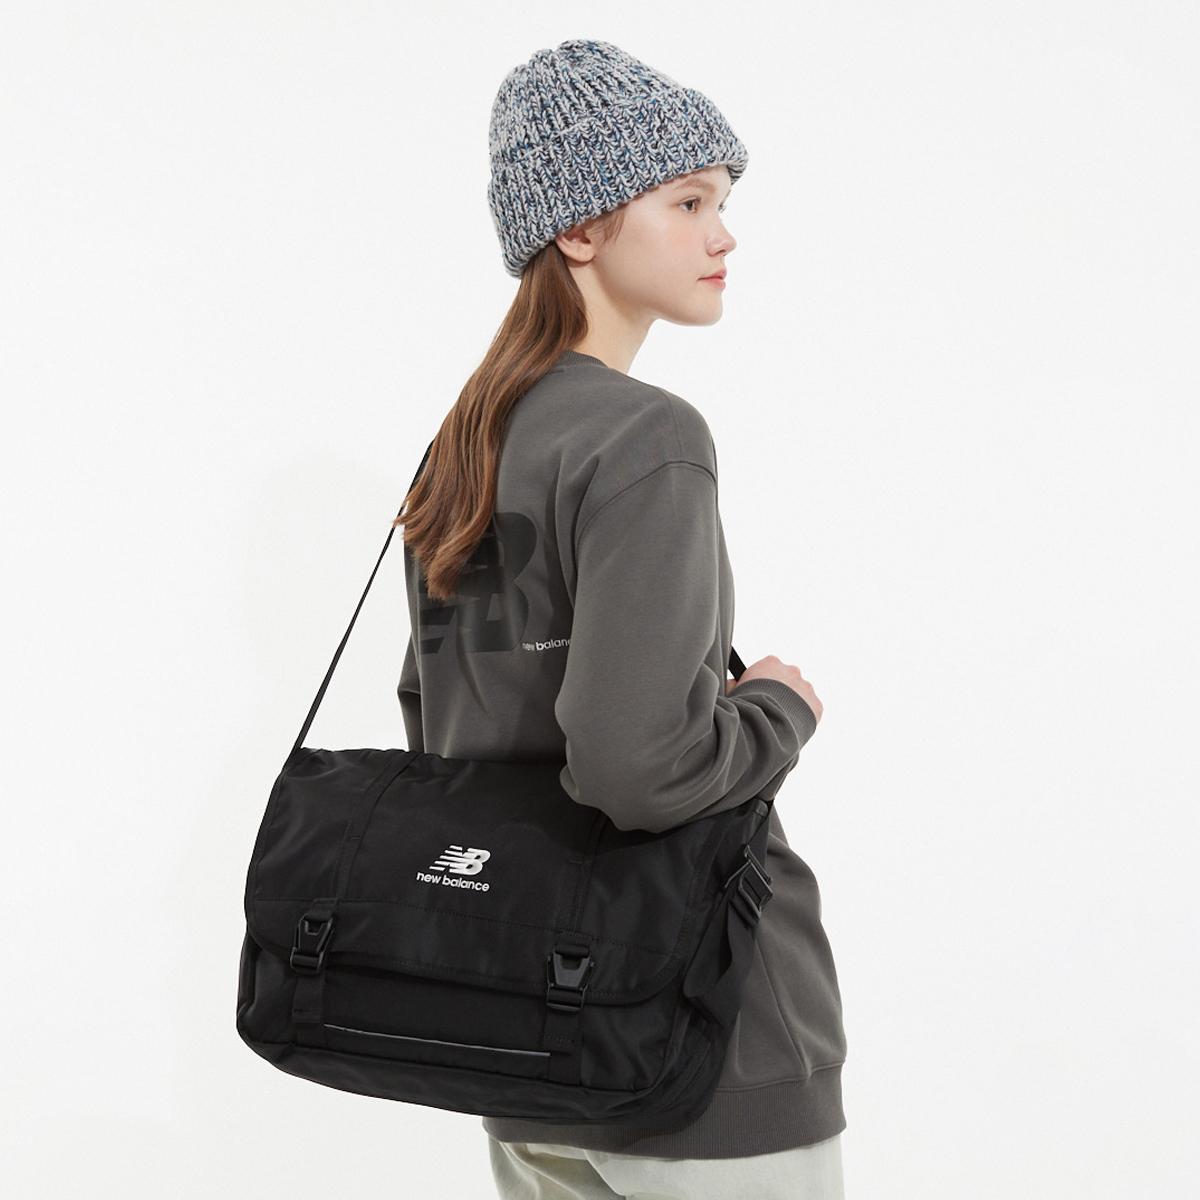 2PIK Plus Messenger bag